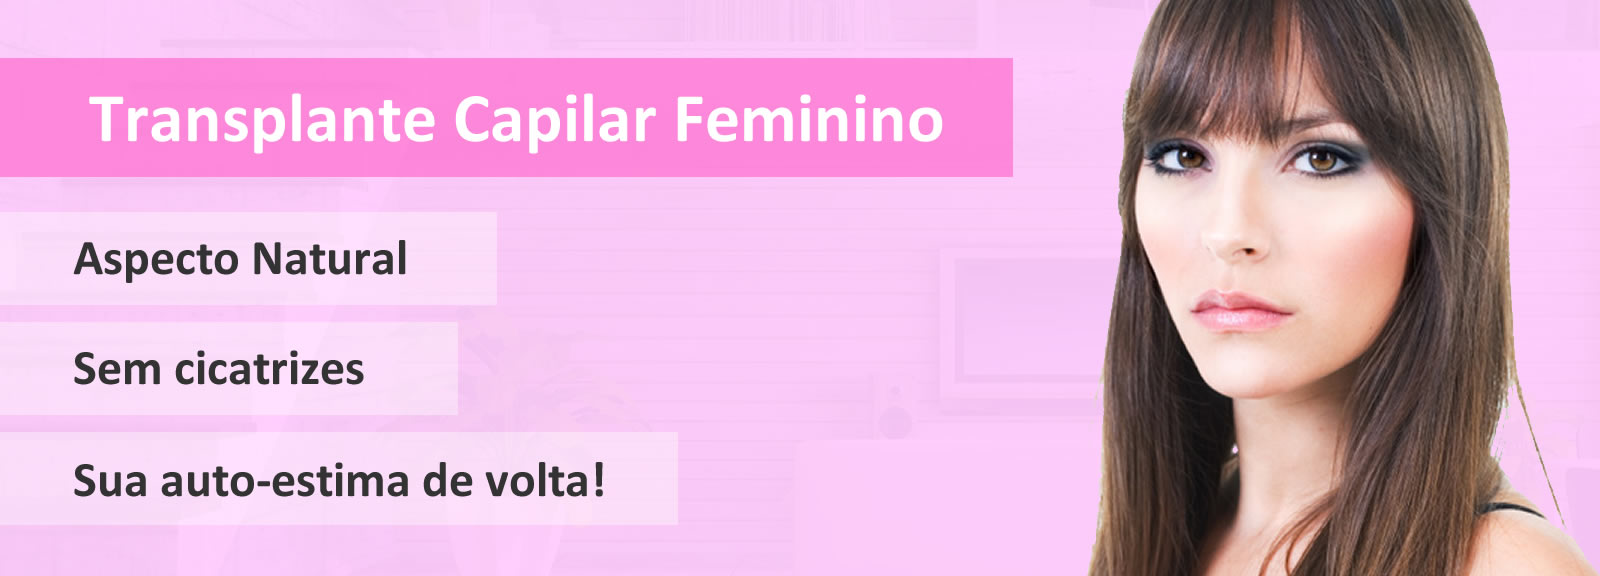 transplante-capilar-feminino-curitiba-belo-horizonte-2